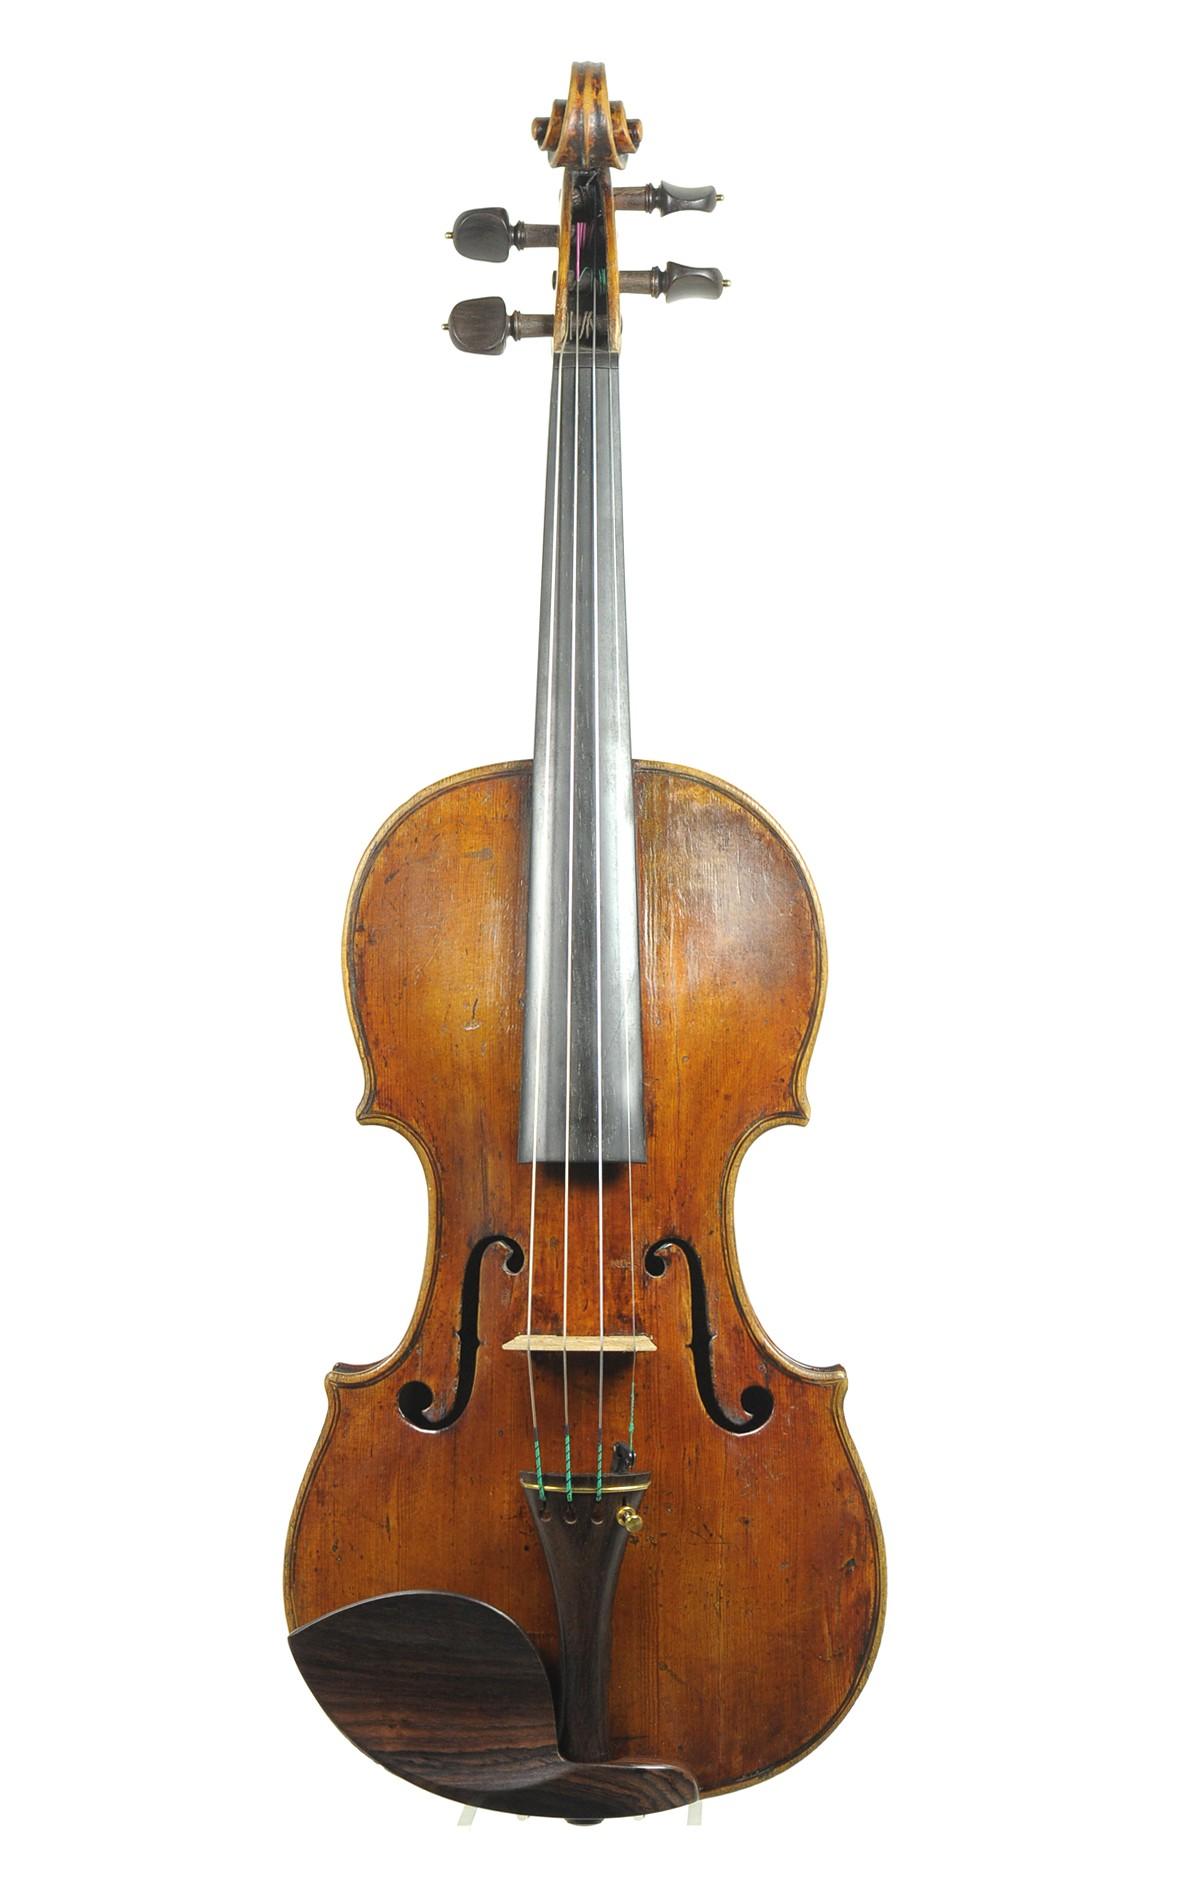 Pieter Rombouts violin circa 1720